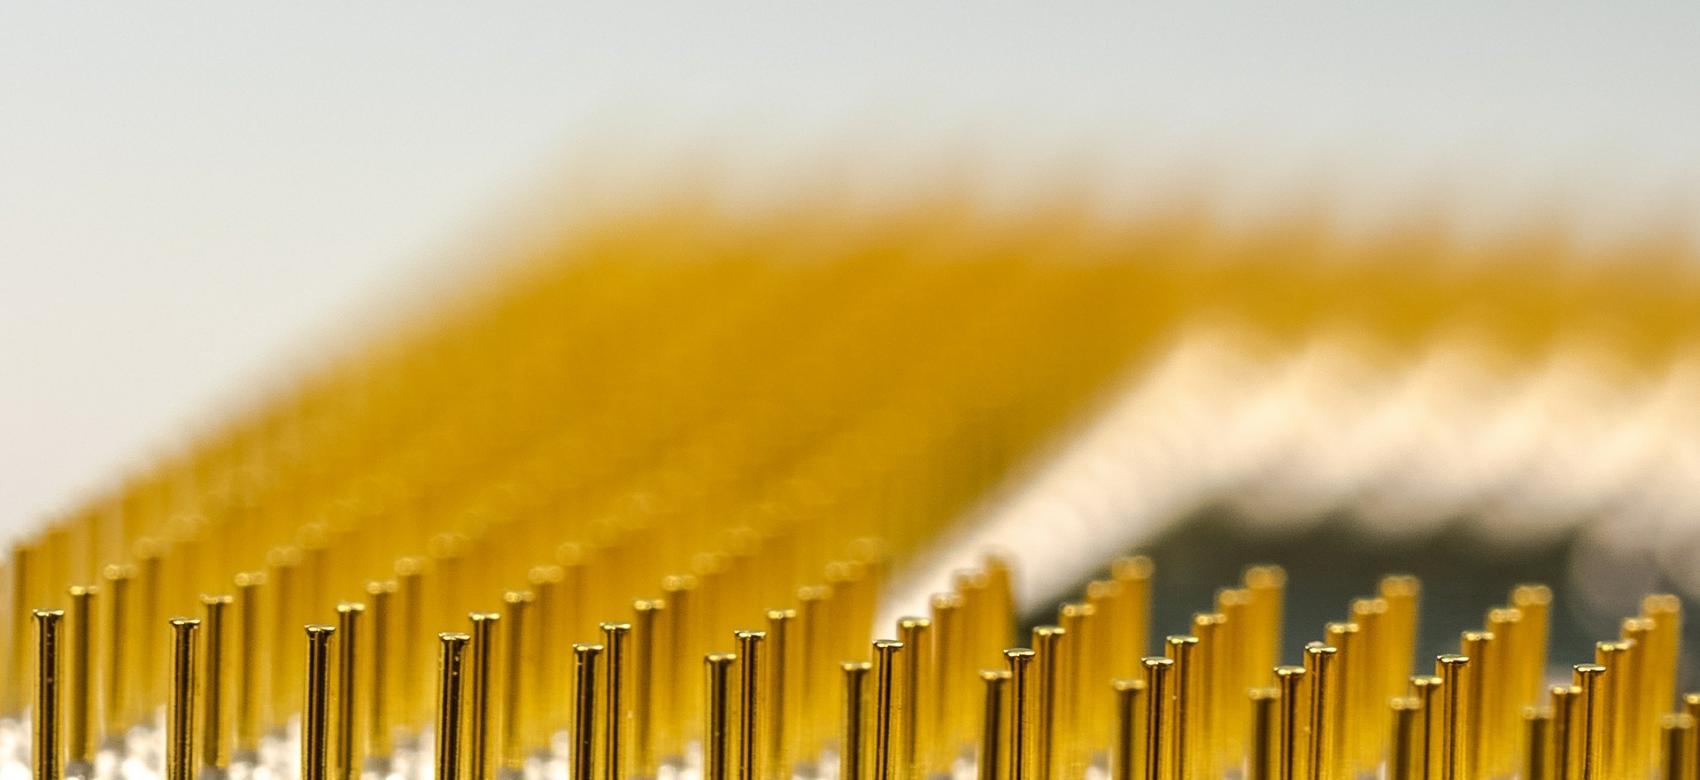 Imagen de múltiples clavos dorados